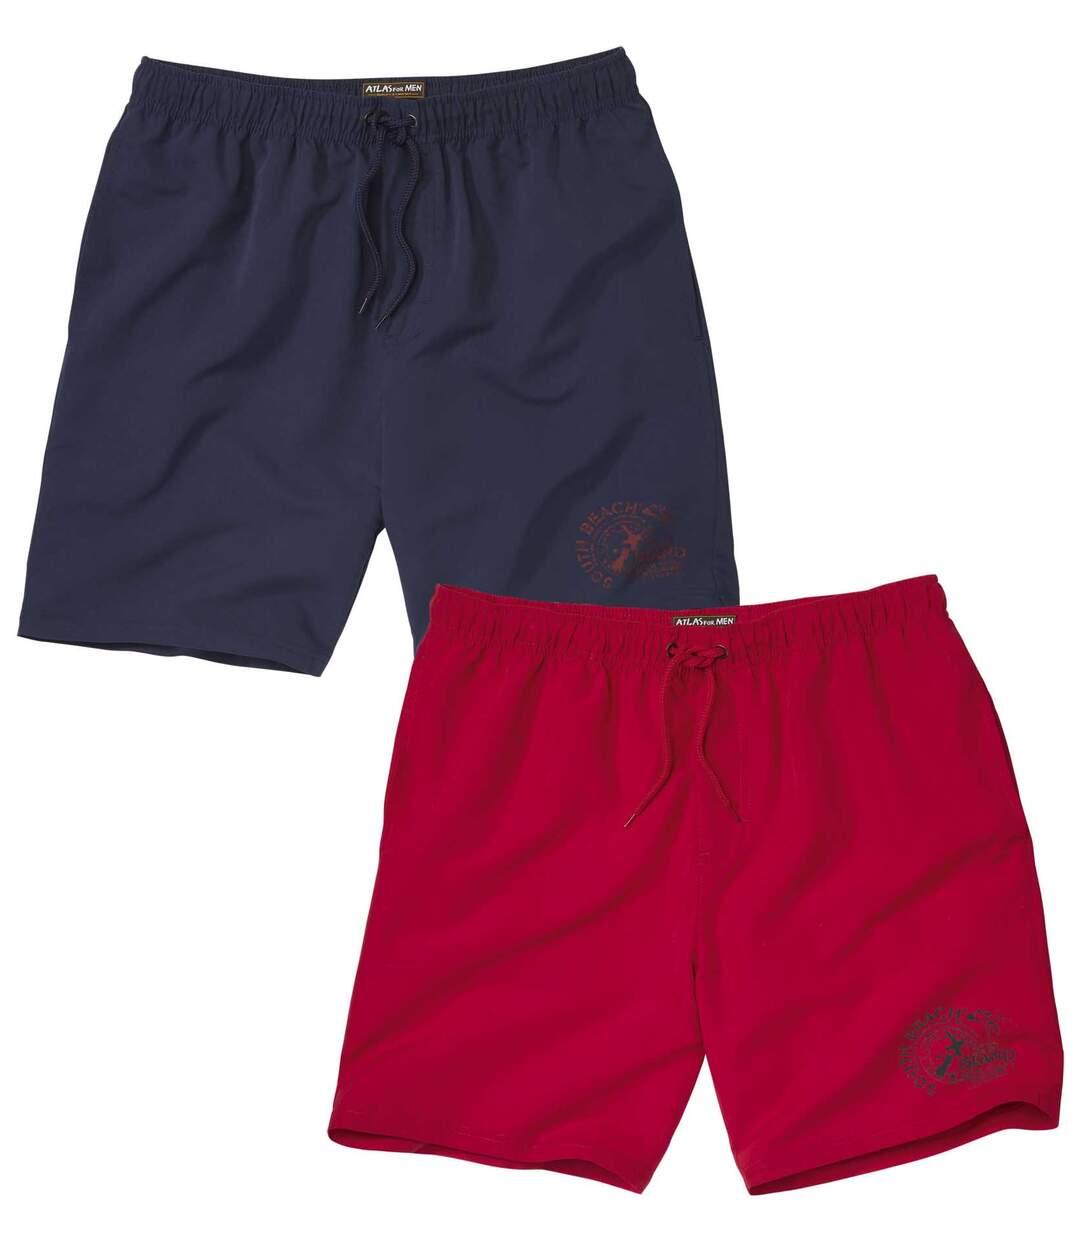 2er-Pack Shorts Sport aus Microfaser